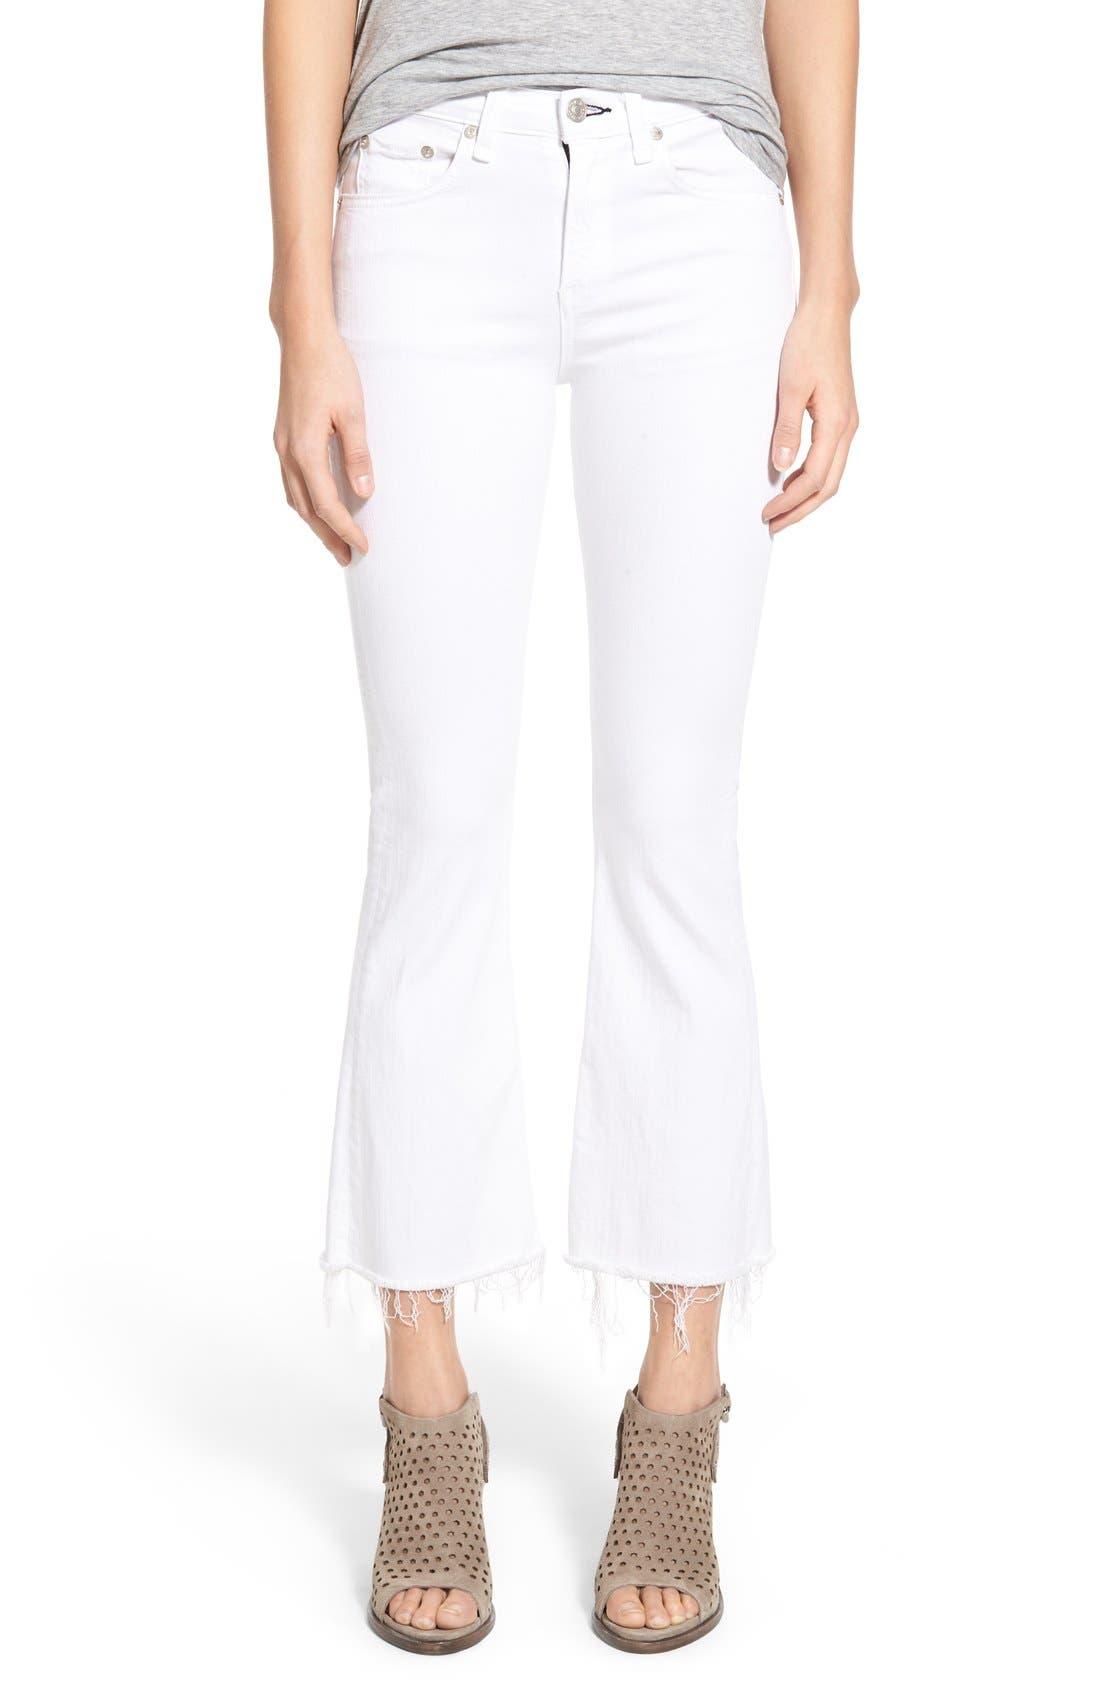 RAG & BONE, High Rise Raw Hem Crop Flare Jeans, Main thumbnail 1, color, BRIGHT WHITE